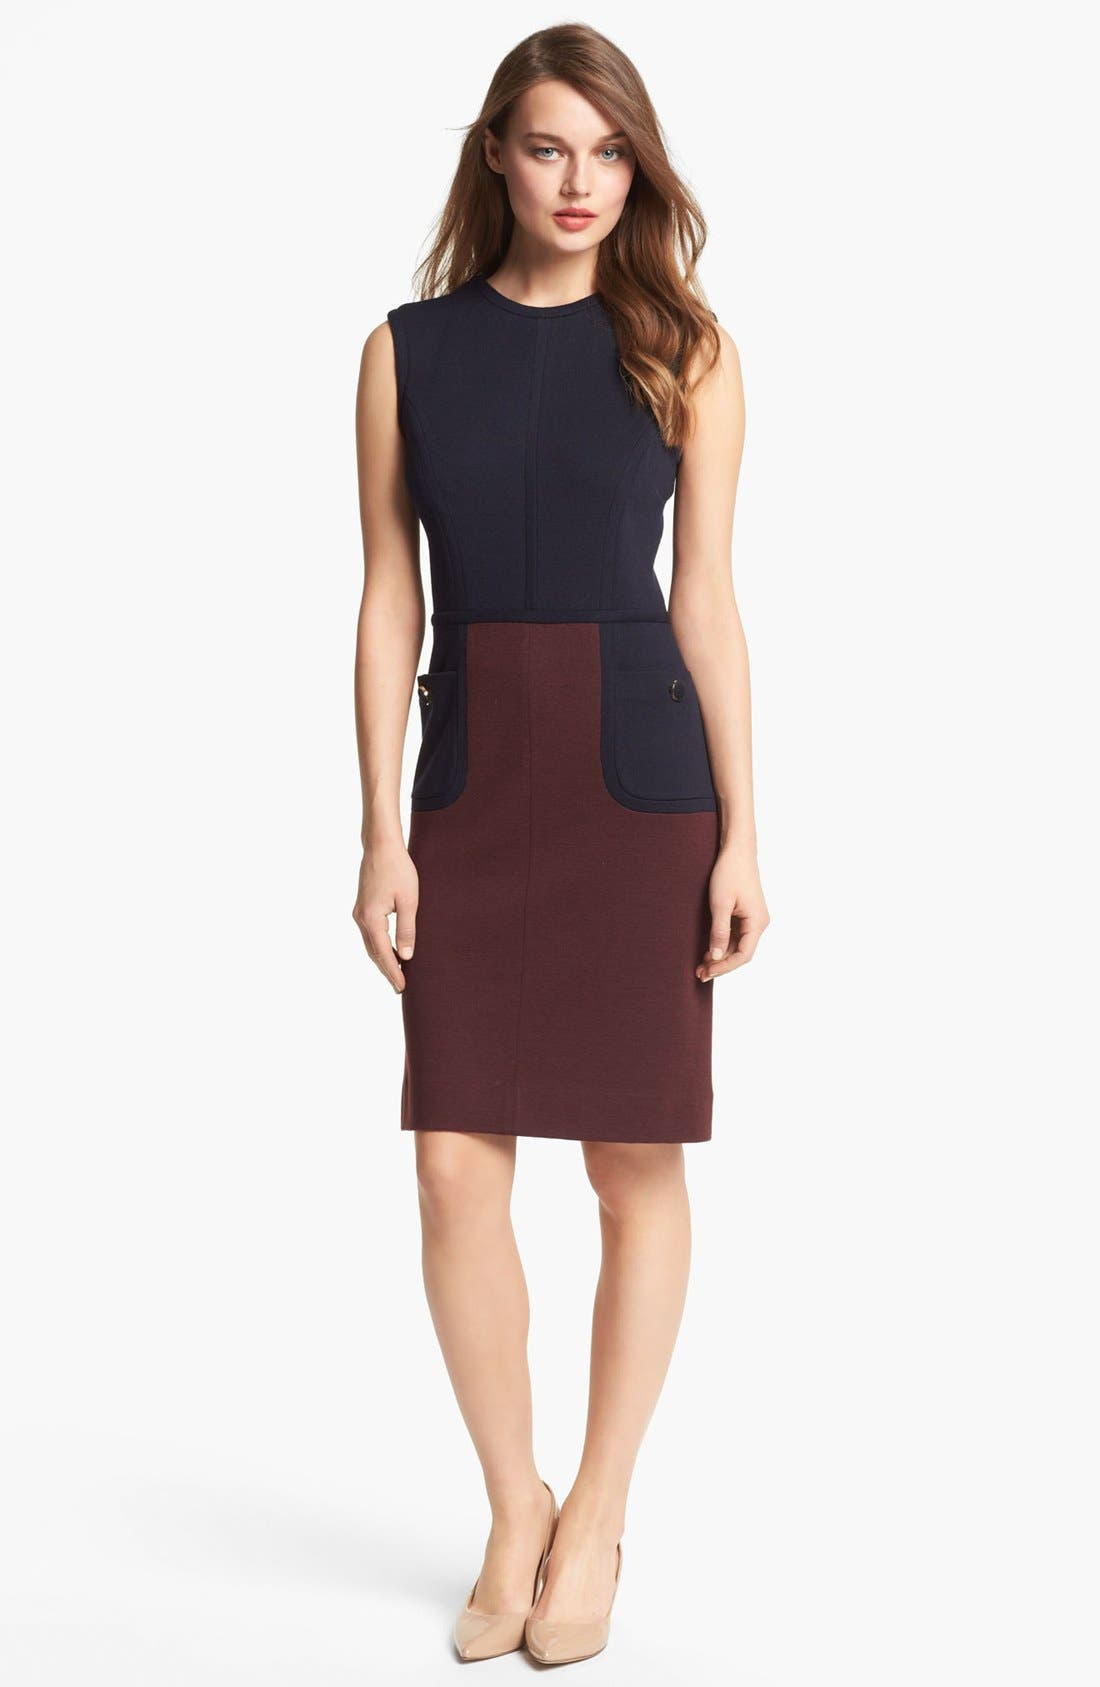 Main Image - Tory Burch 'Brianna' Colorblock Sheath Dress